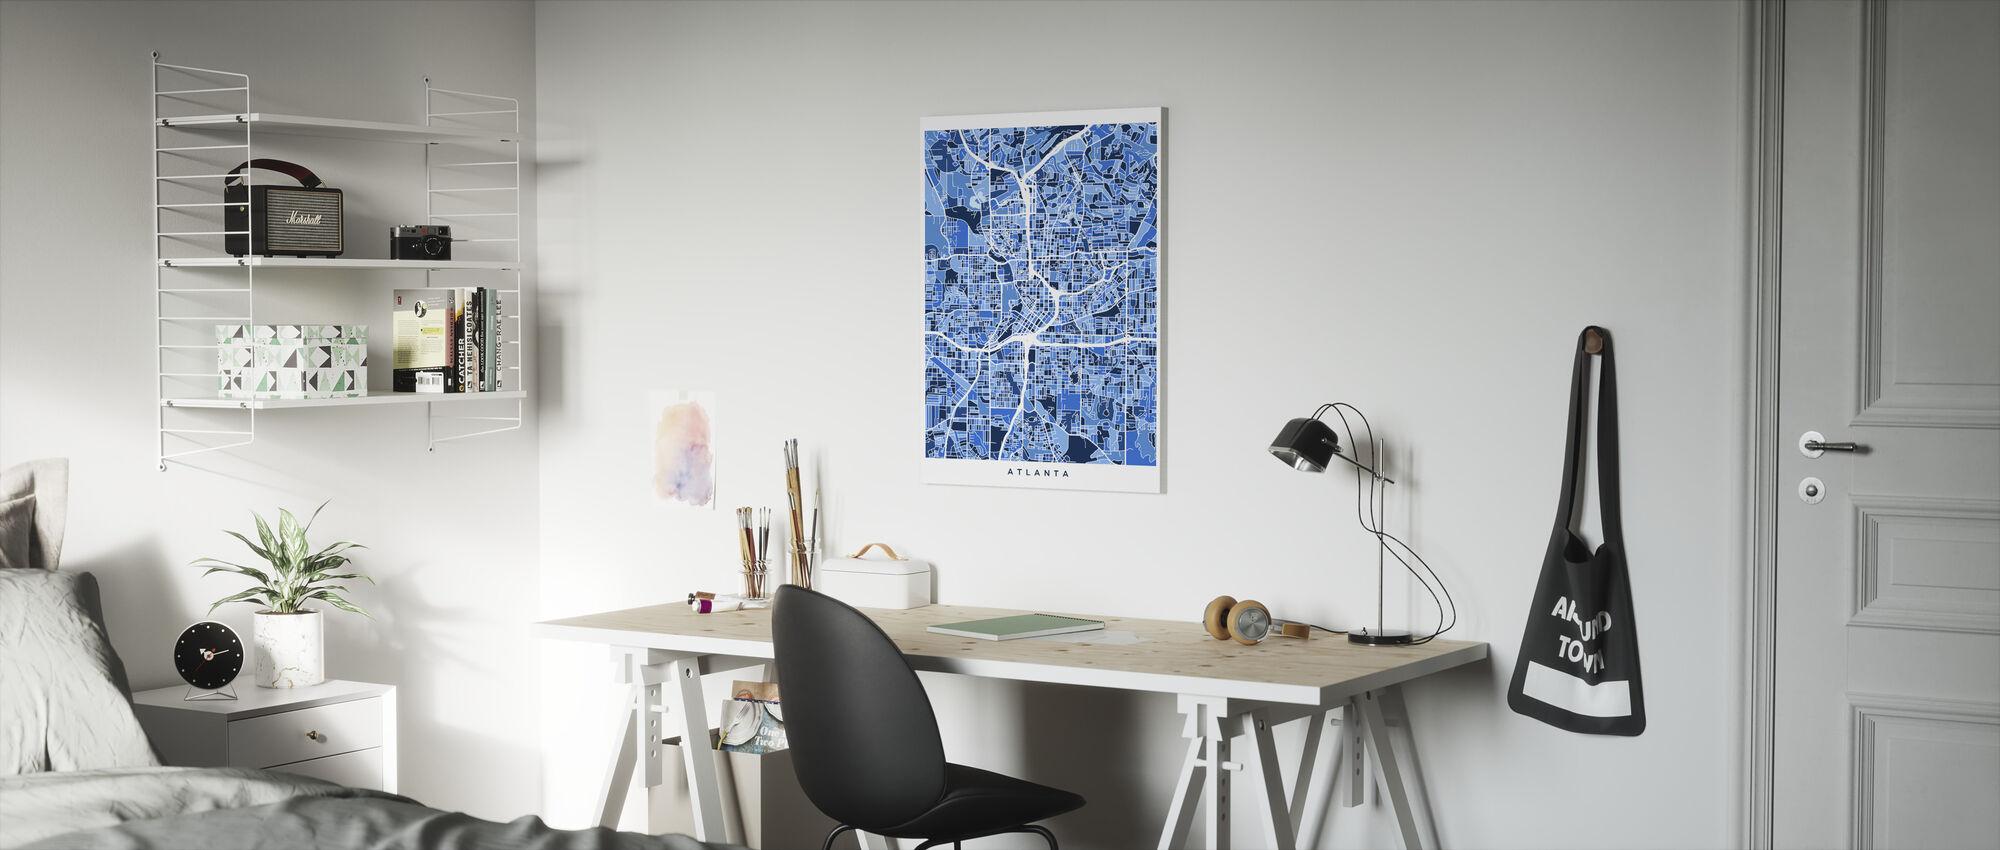 Atlanta Georgia City Map - Canvas print - Kids Room